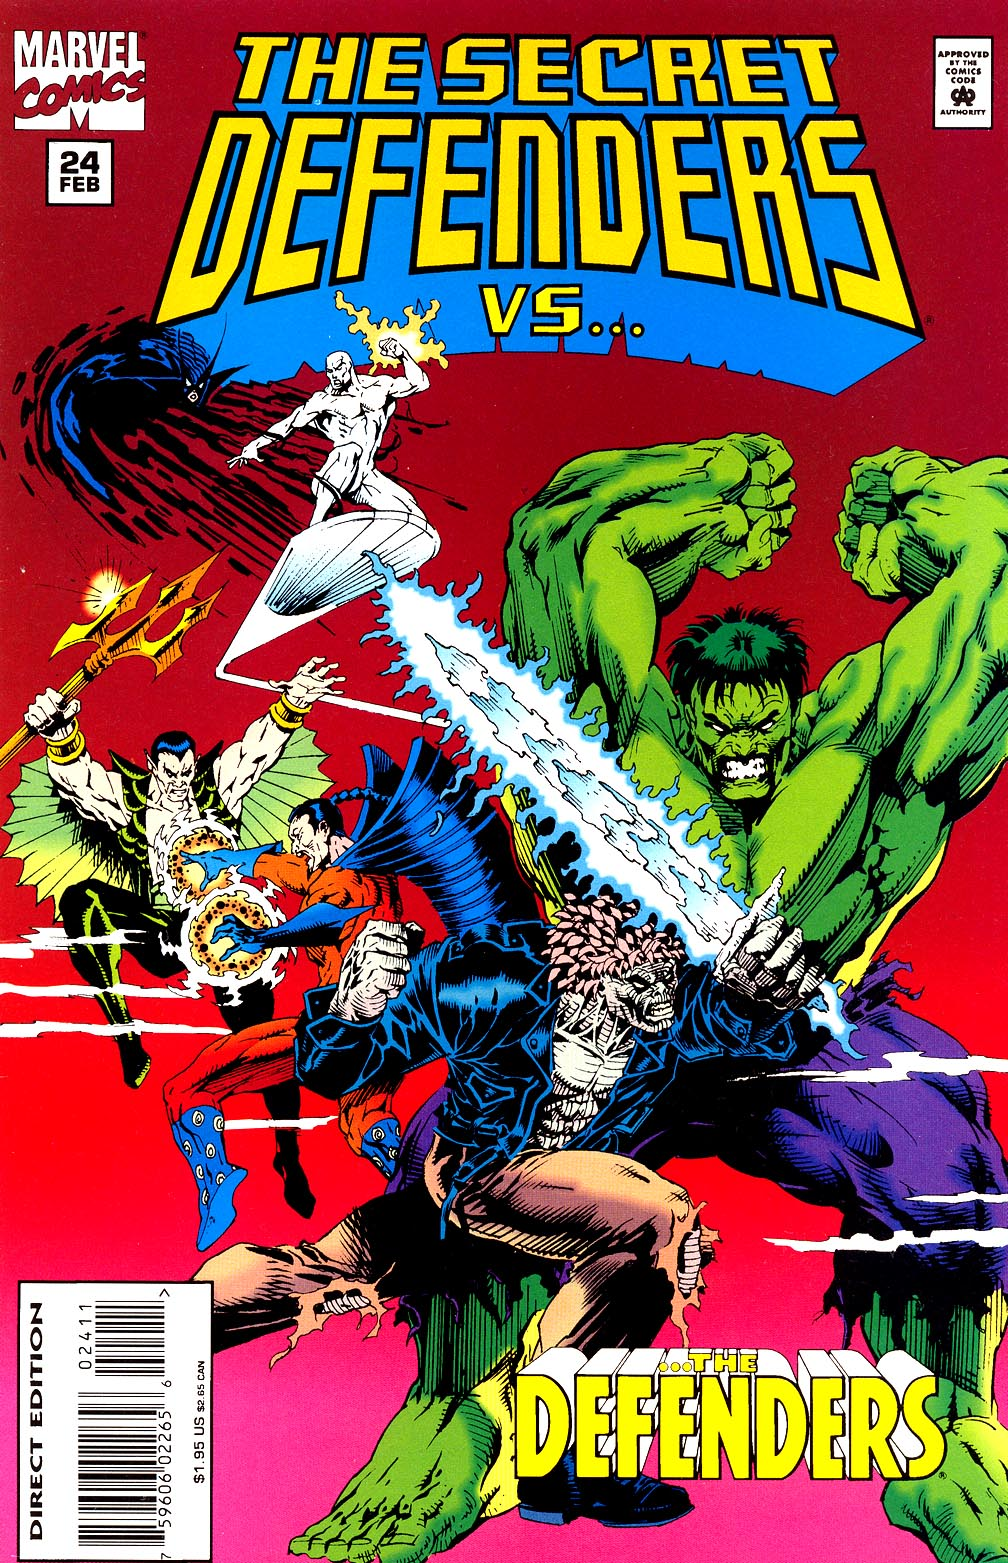 Read online Secret Defenders comic -  Issue #24 - 1